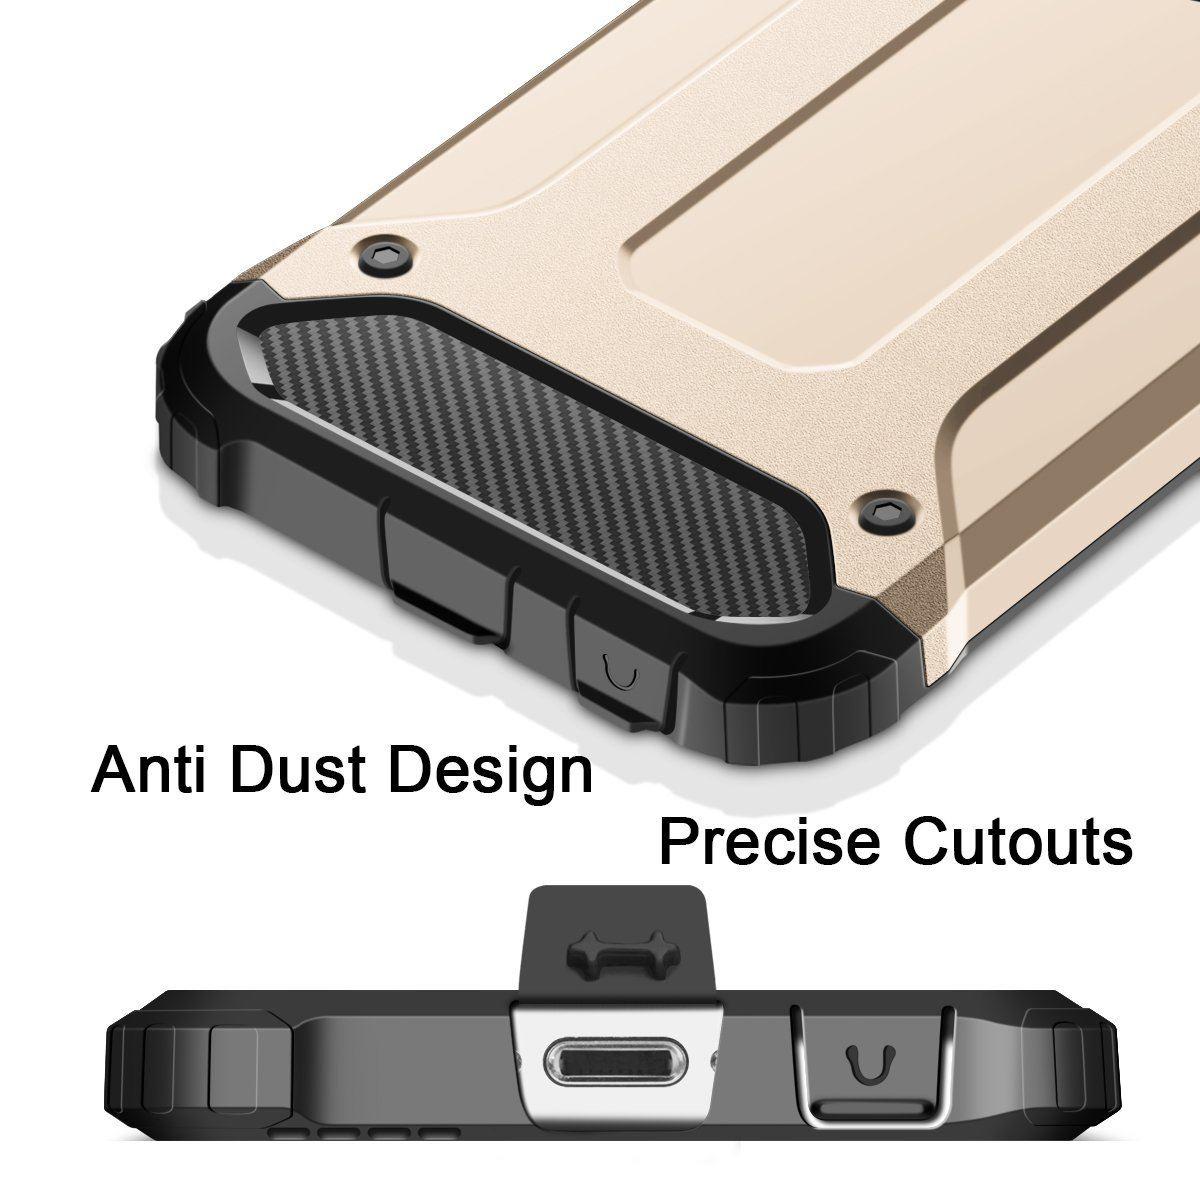 thumbnail 11 - For Apple iPhone 11 Pro Max XR Xs X 8 7 Plus 6 5 Se Case Cover Impact Heavy Duty